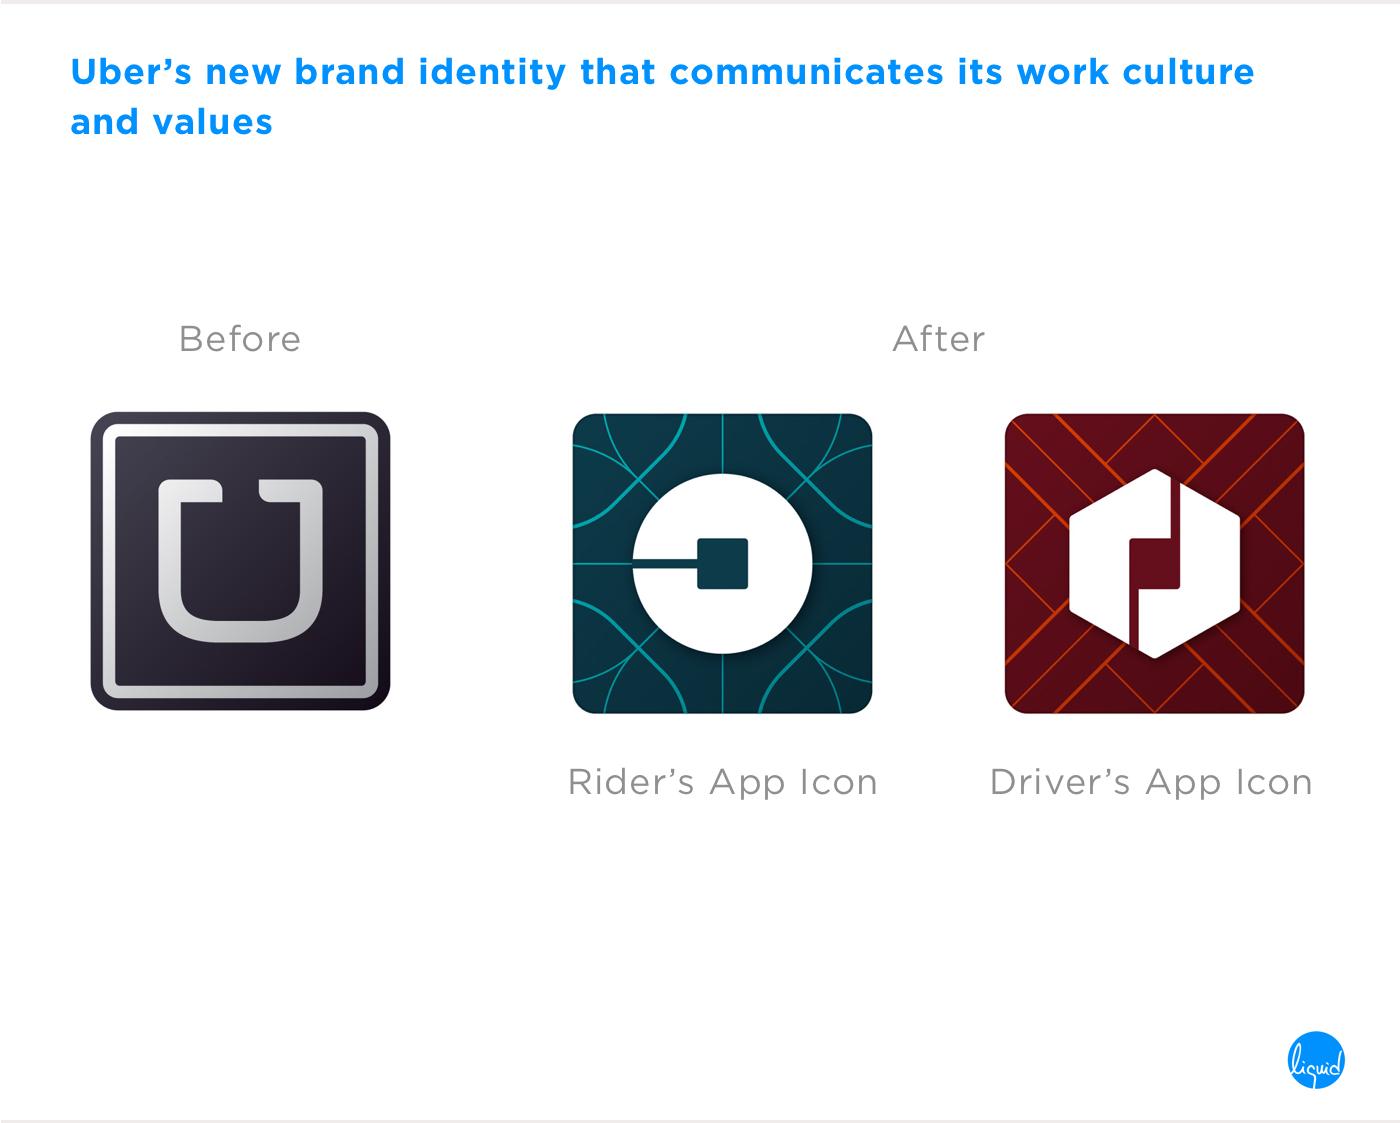 Brand Identity of Uber